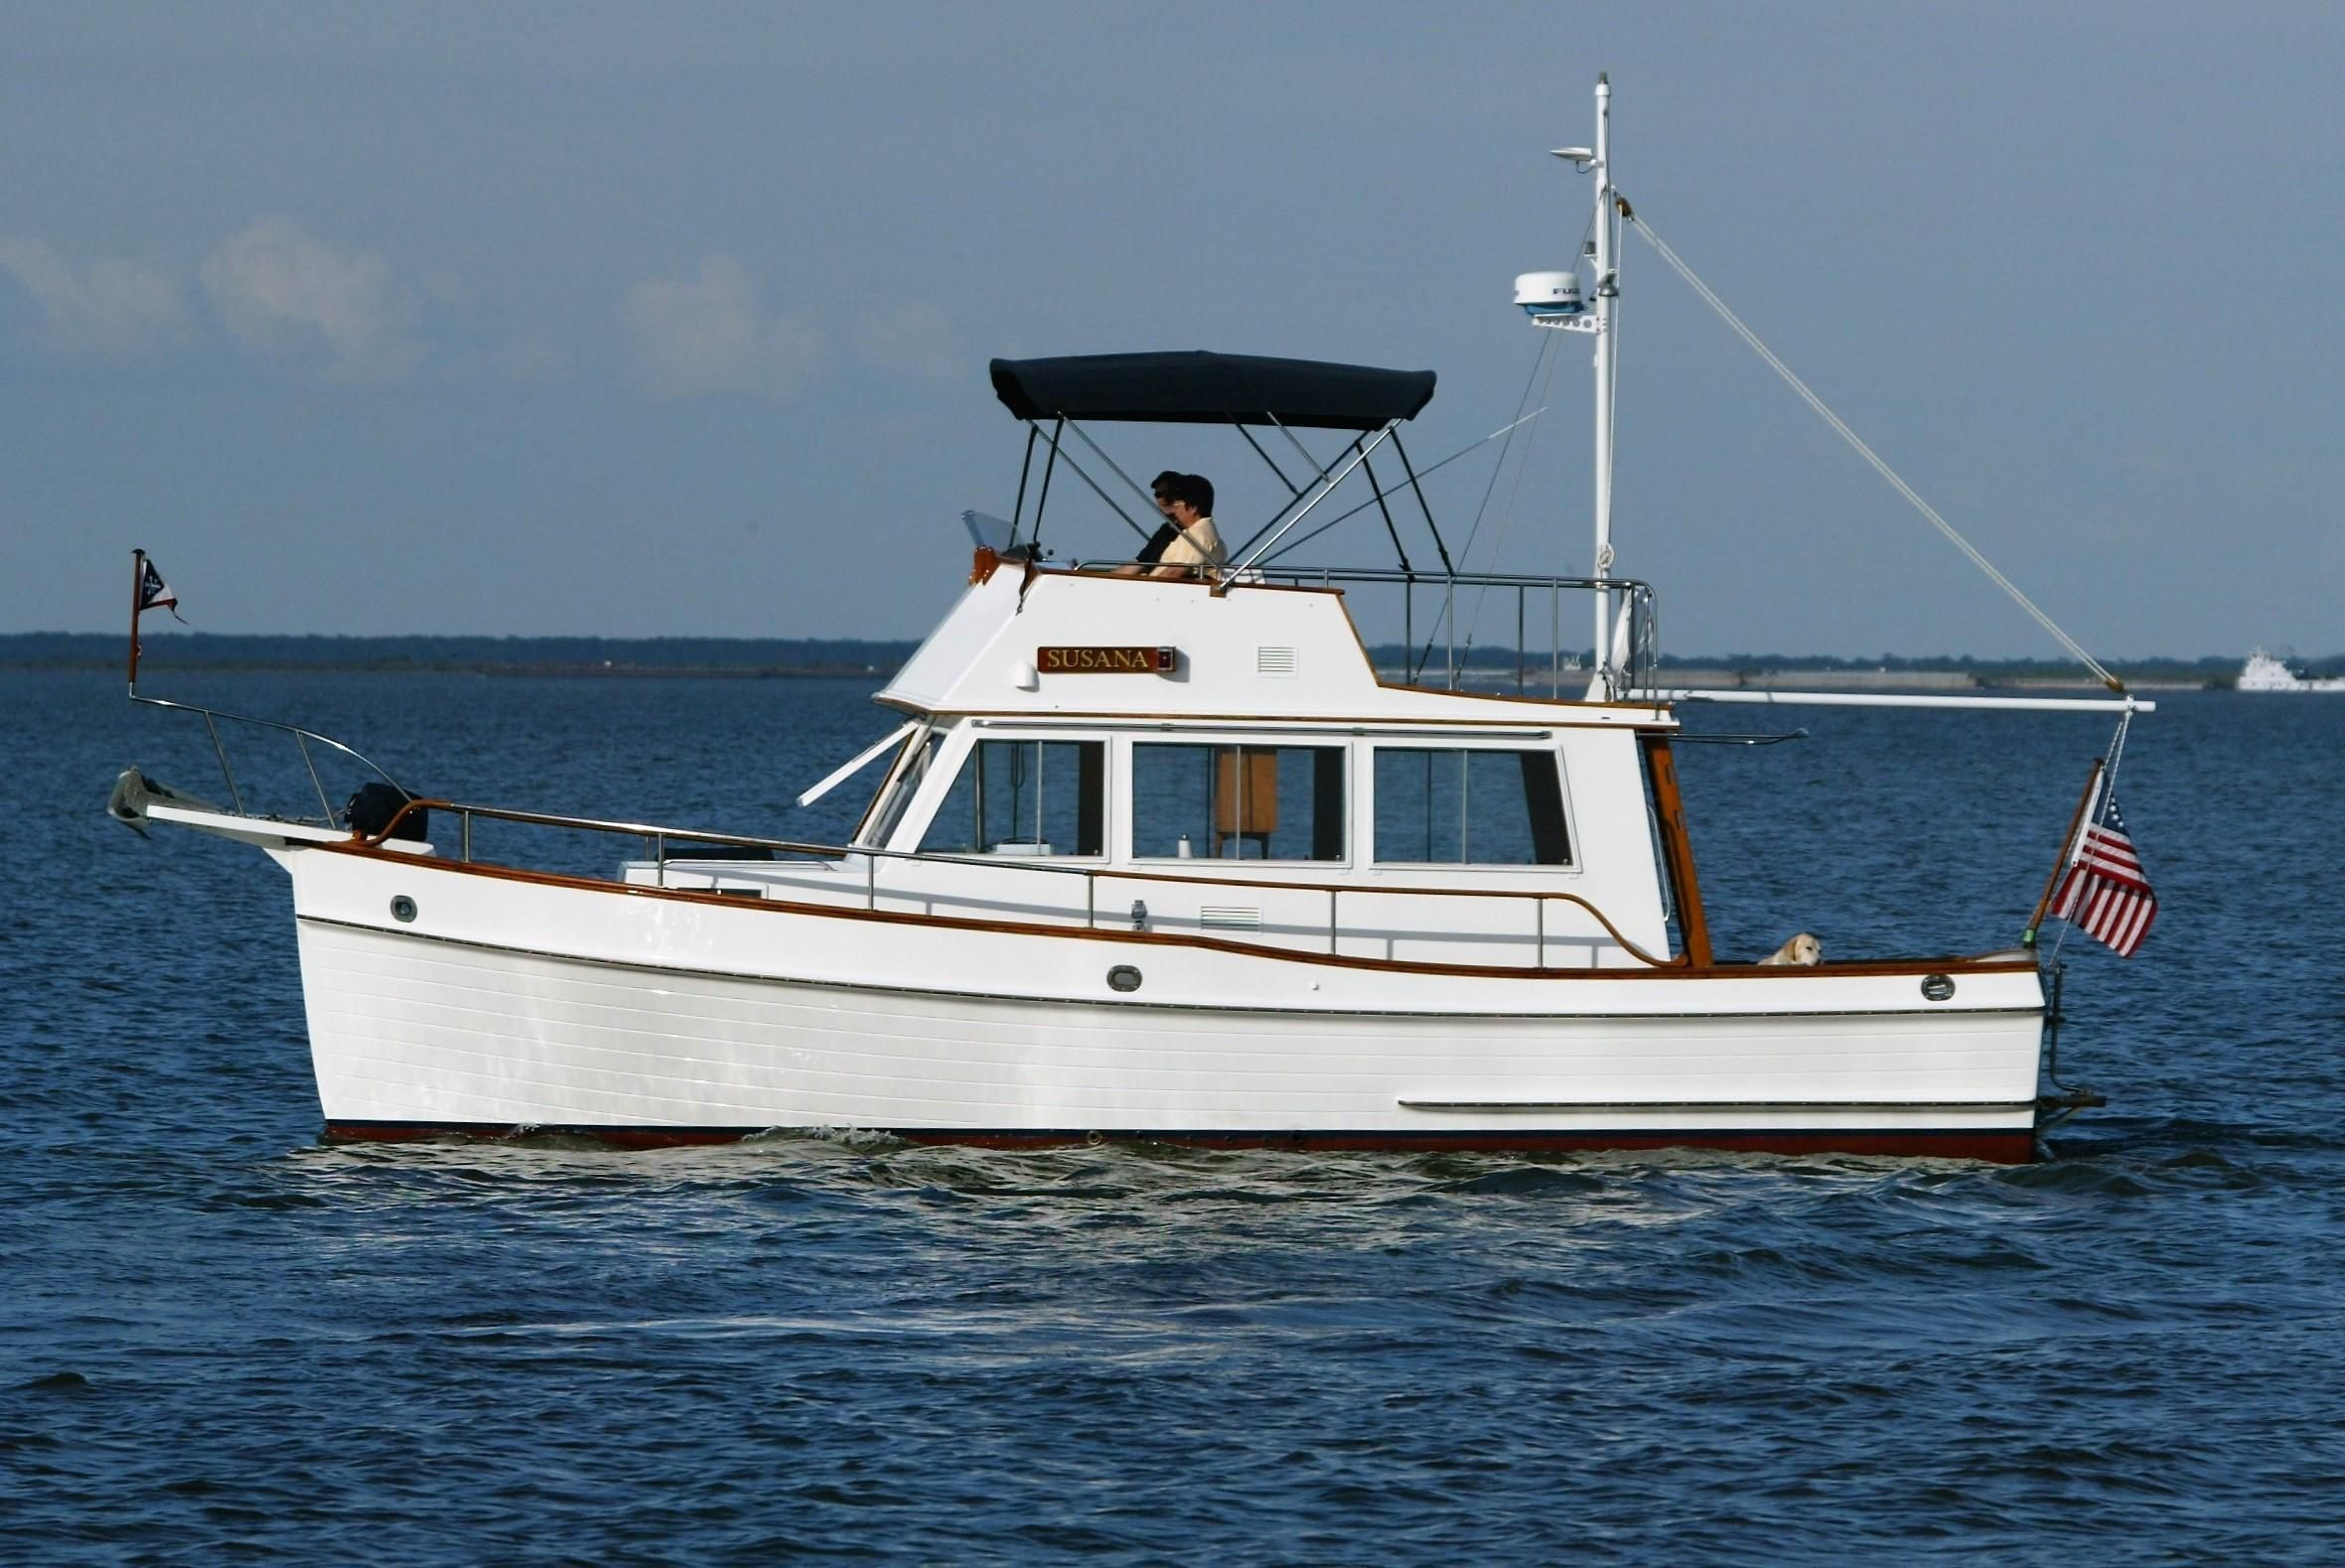 1985 Grand Banks 32 Sedan Power Boat For Sale www